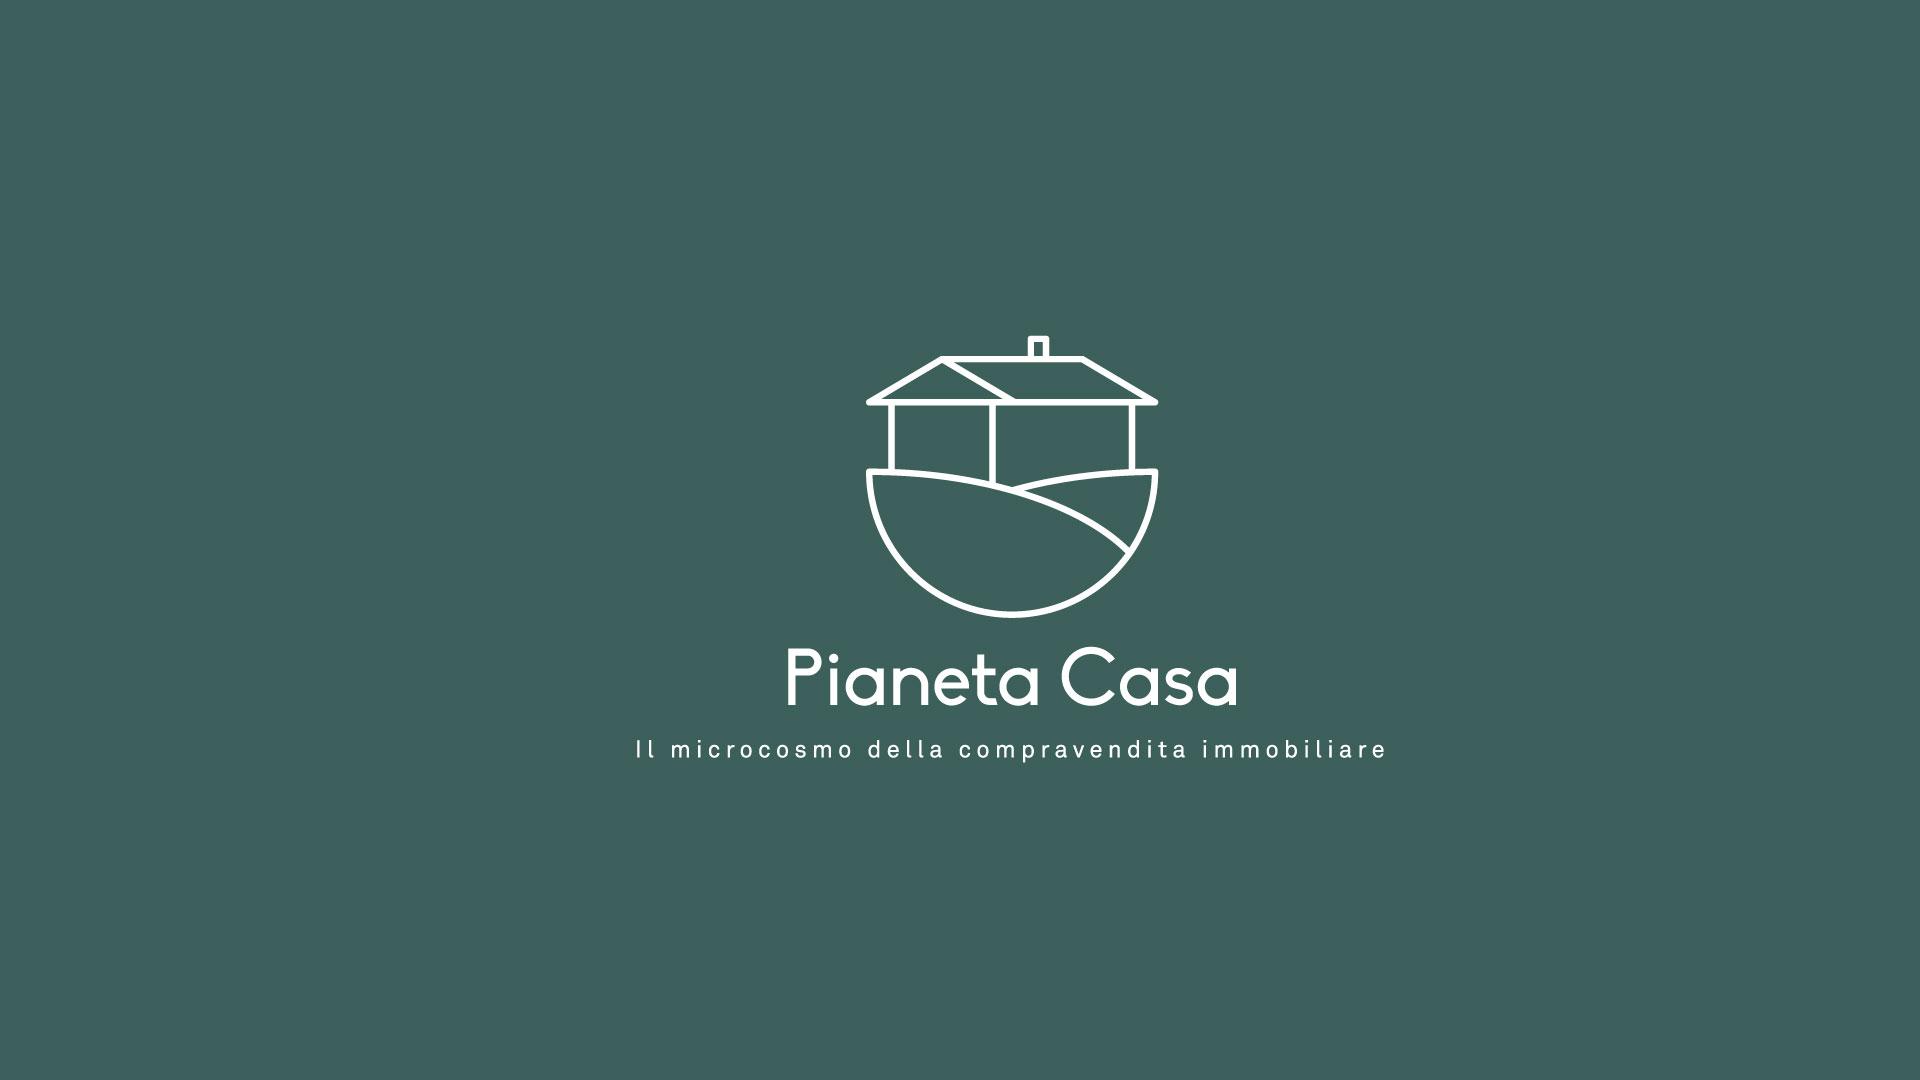 pianeta-casa-logo